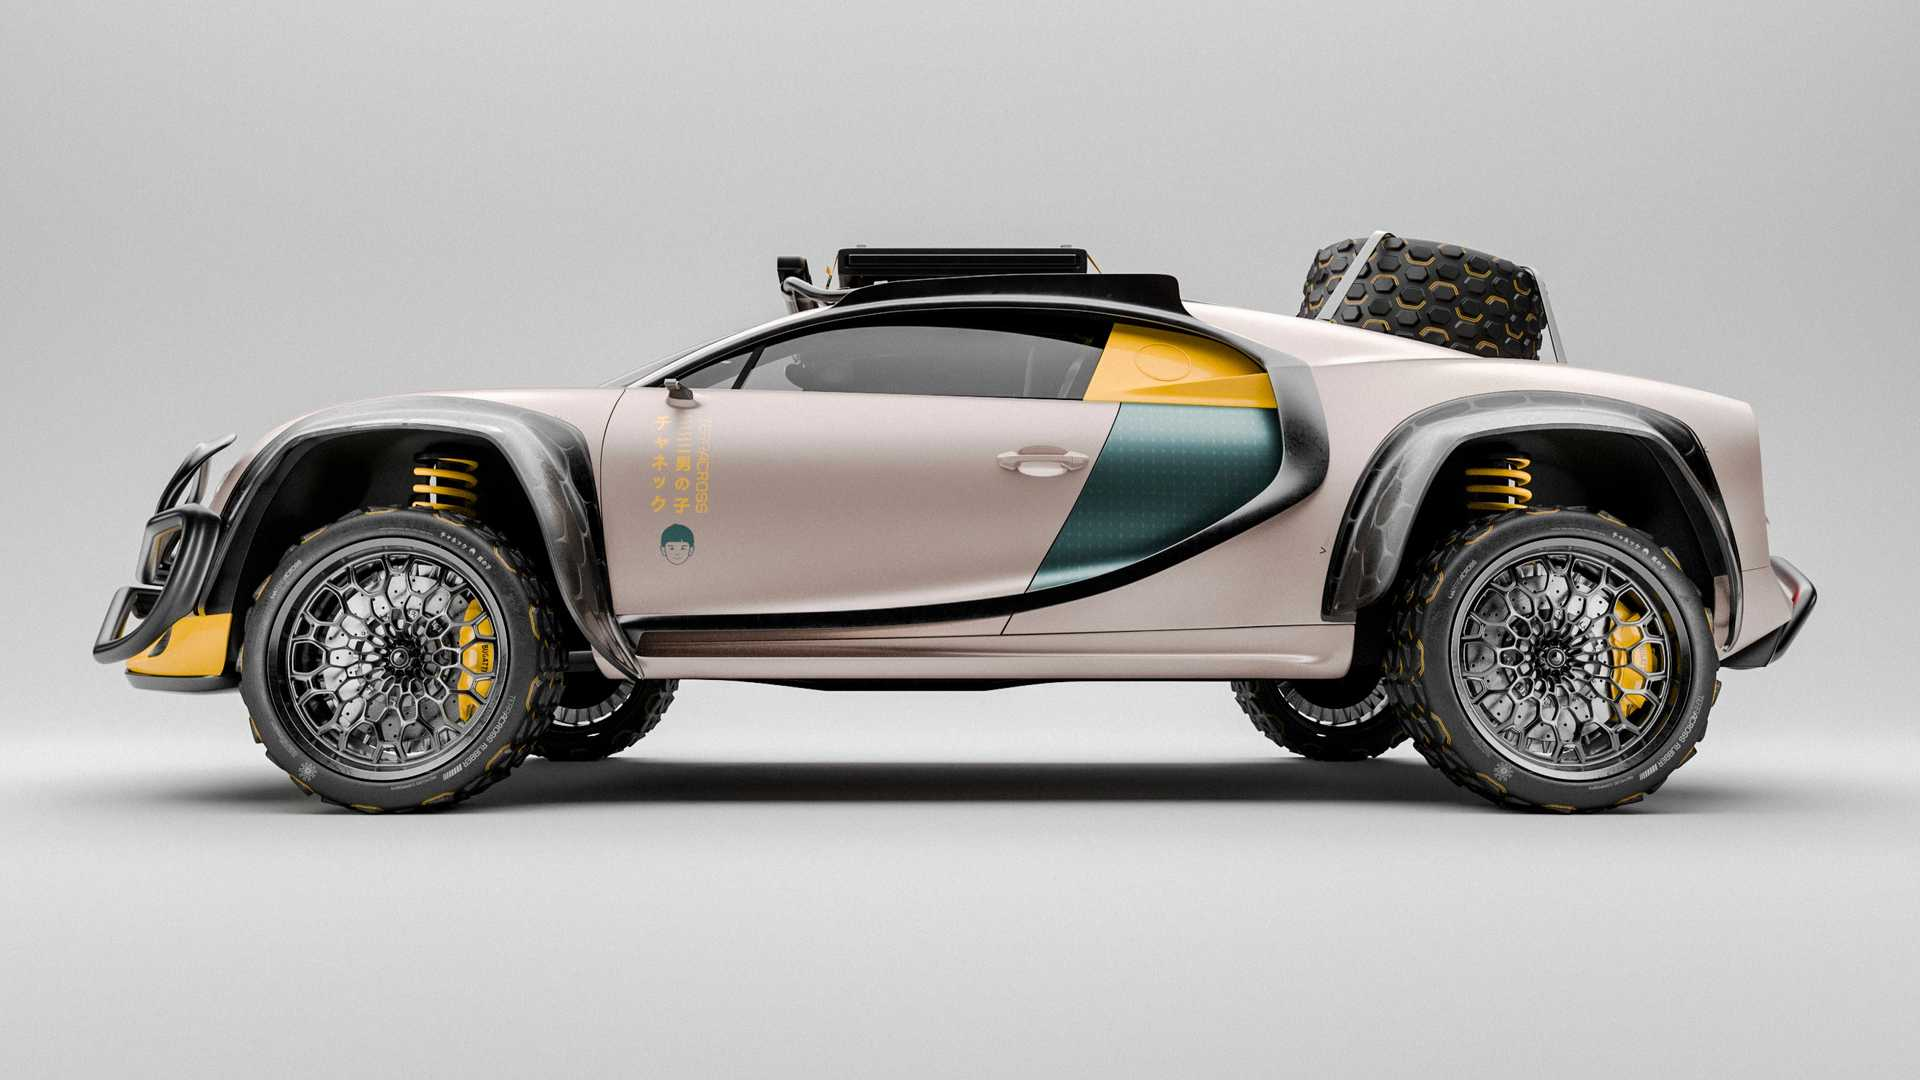 Bugatti Chiron Terracross визуализирован как гипер-внедорожник